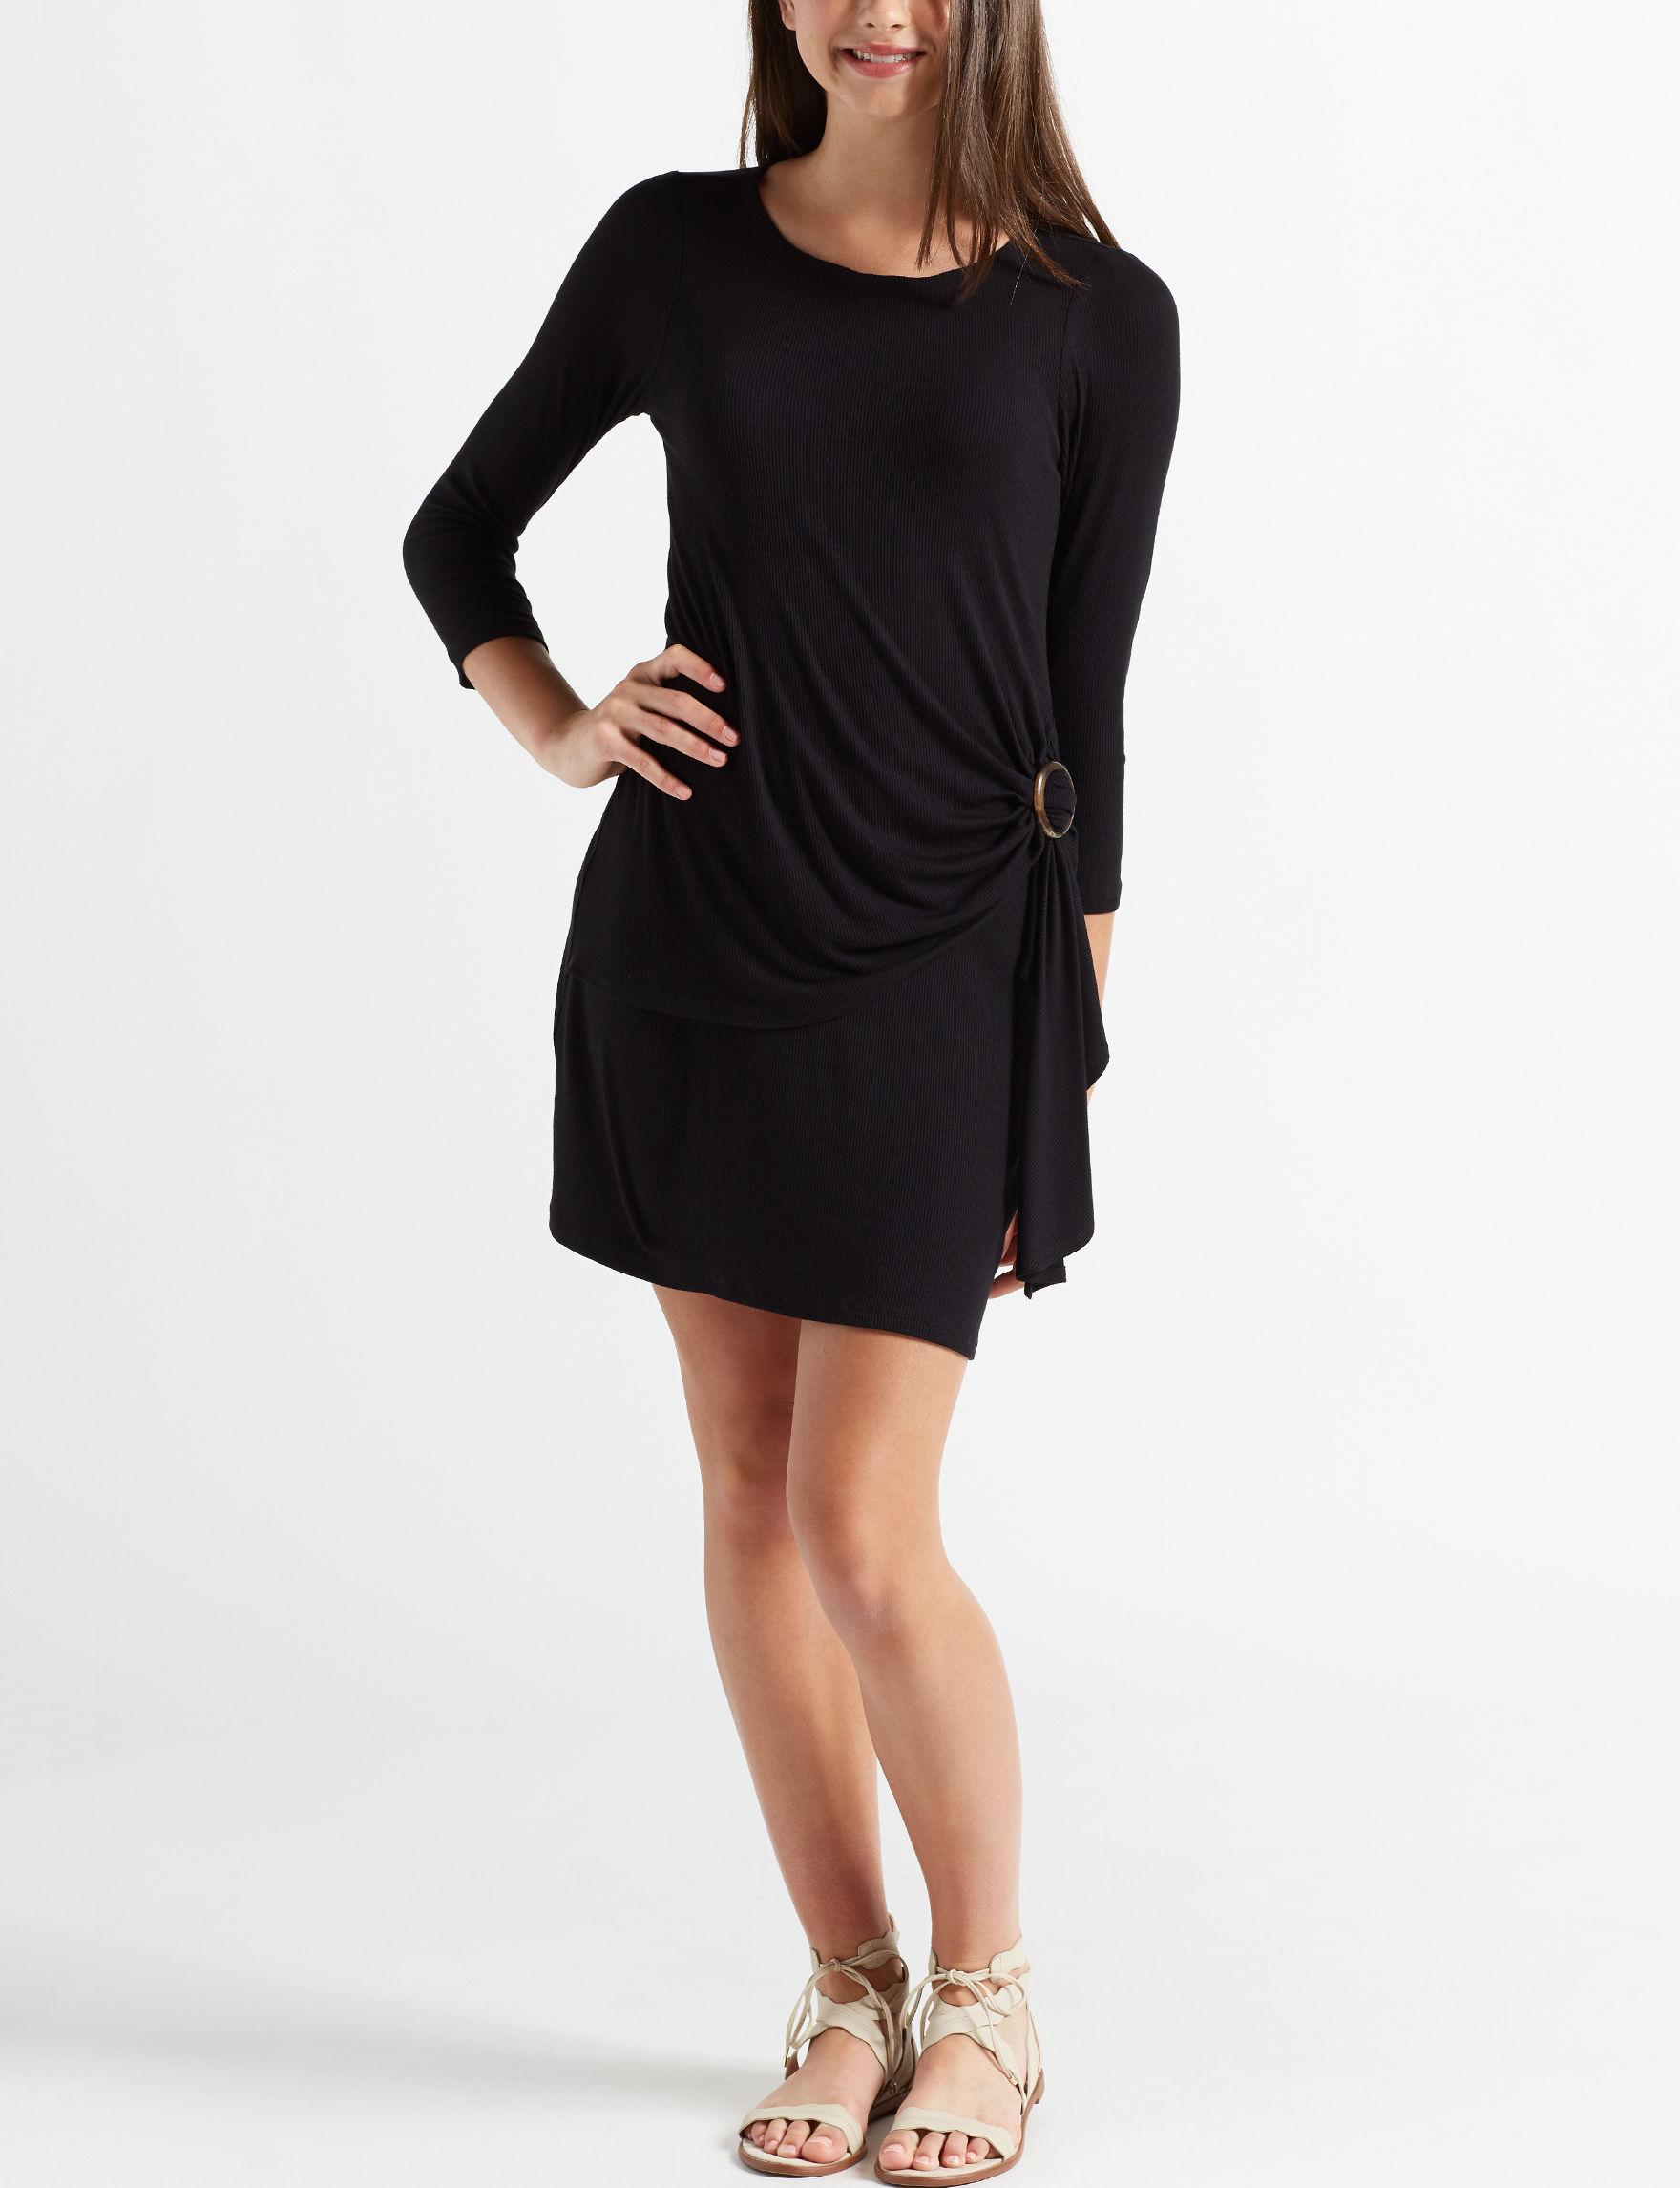 Trixxi Black Cocktail & Party Bodycon Dresses